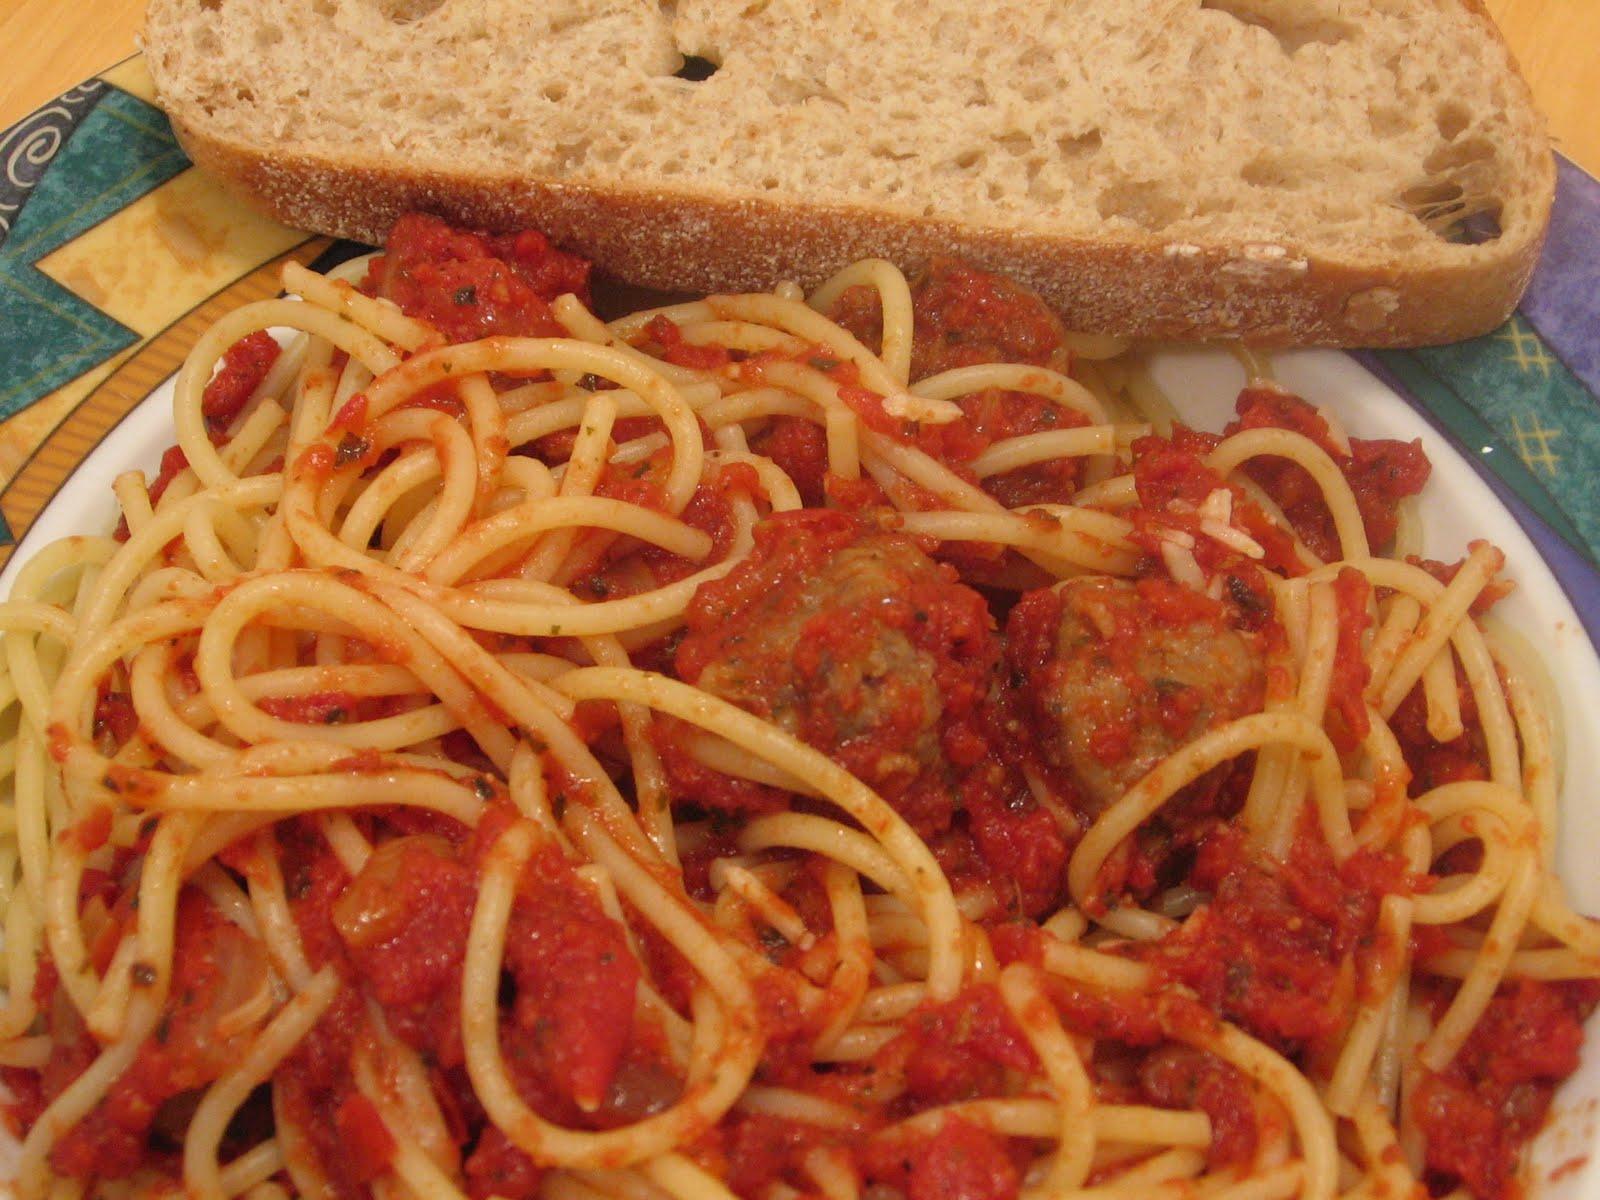 Paul's Spicy Spaghetti Sauce | anotherfoodieblogger  |Spicy Italian Spaghetti